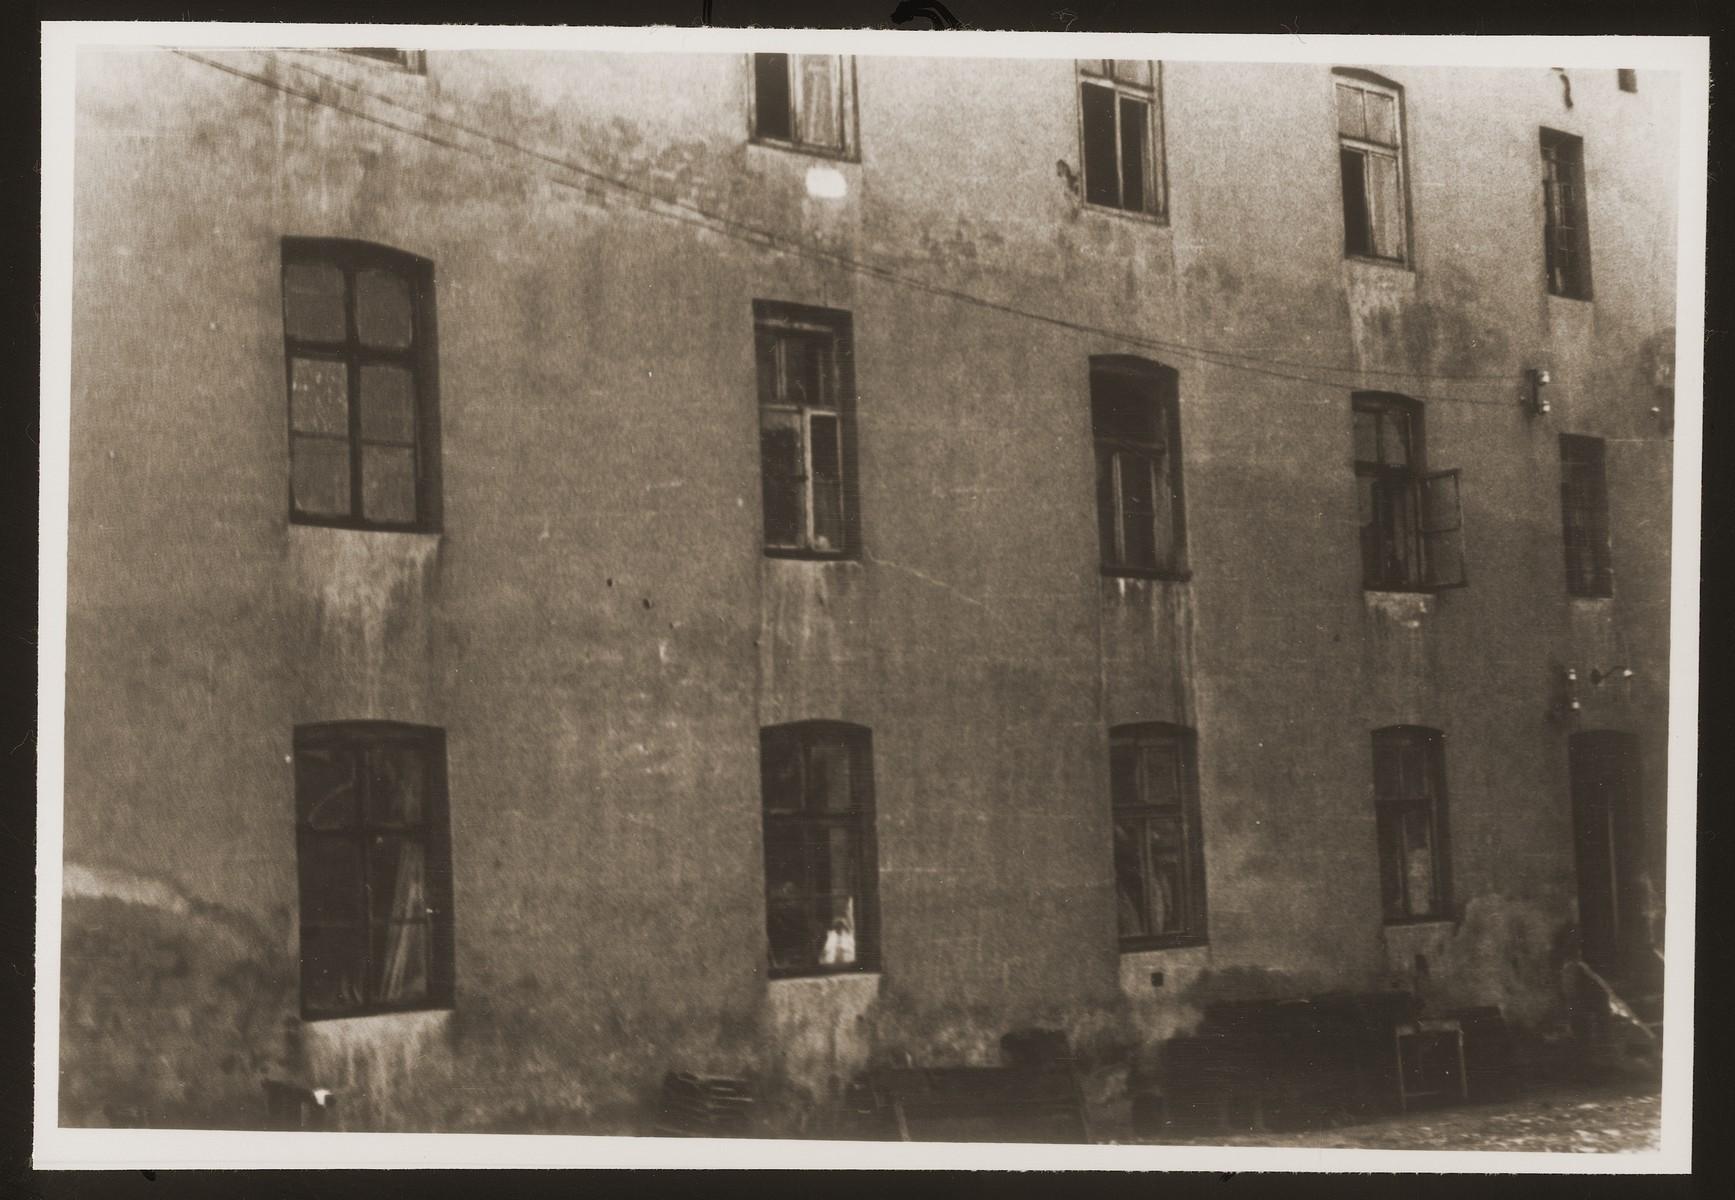 Views of the Bedzin ghetto.